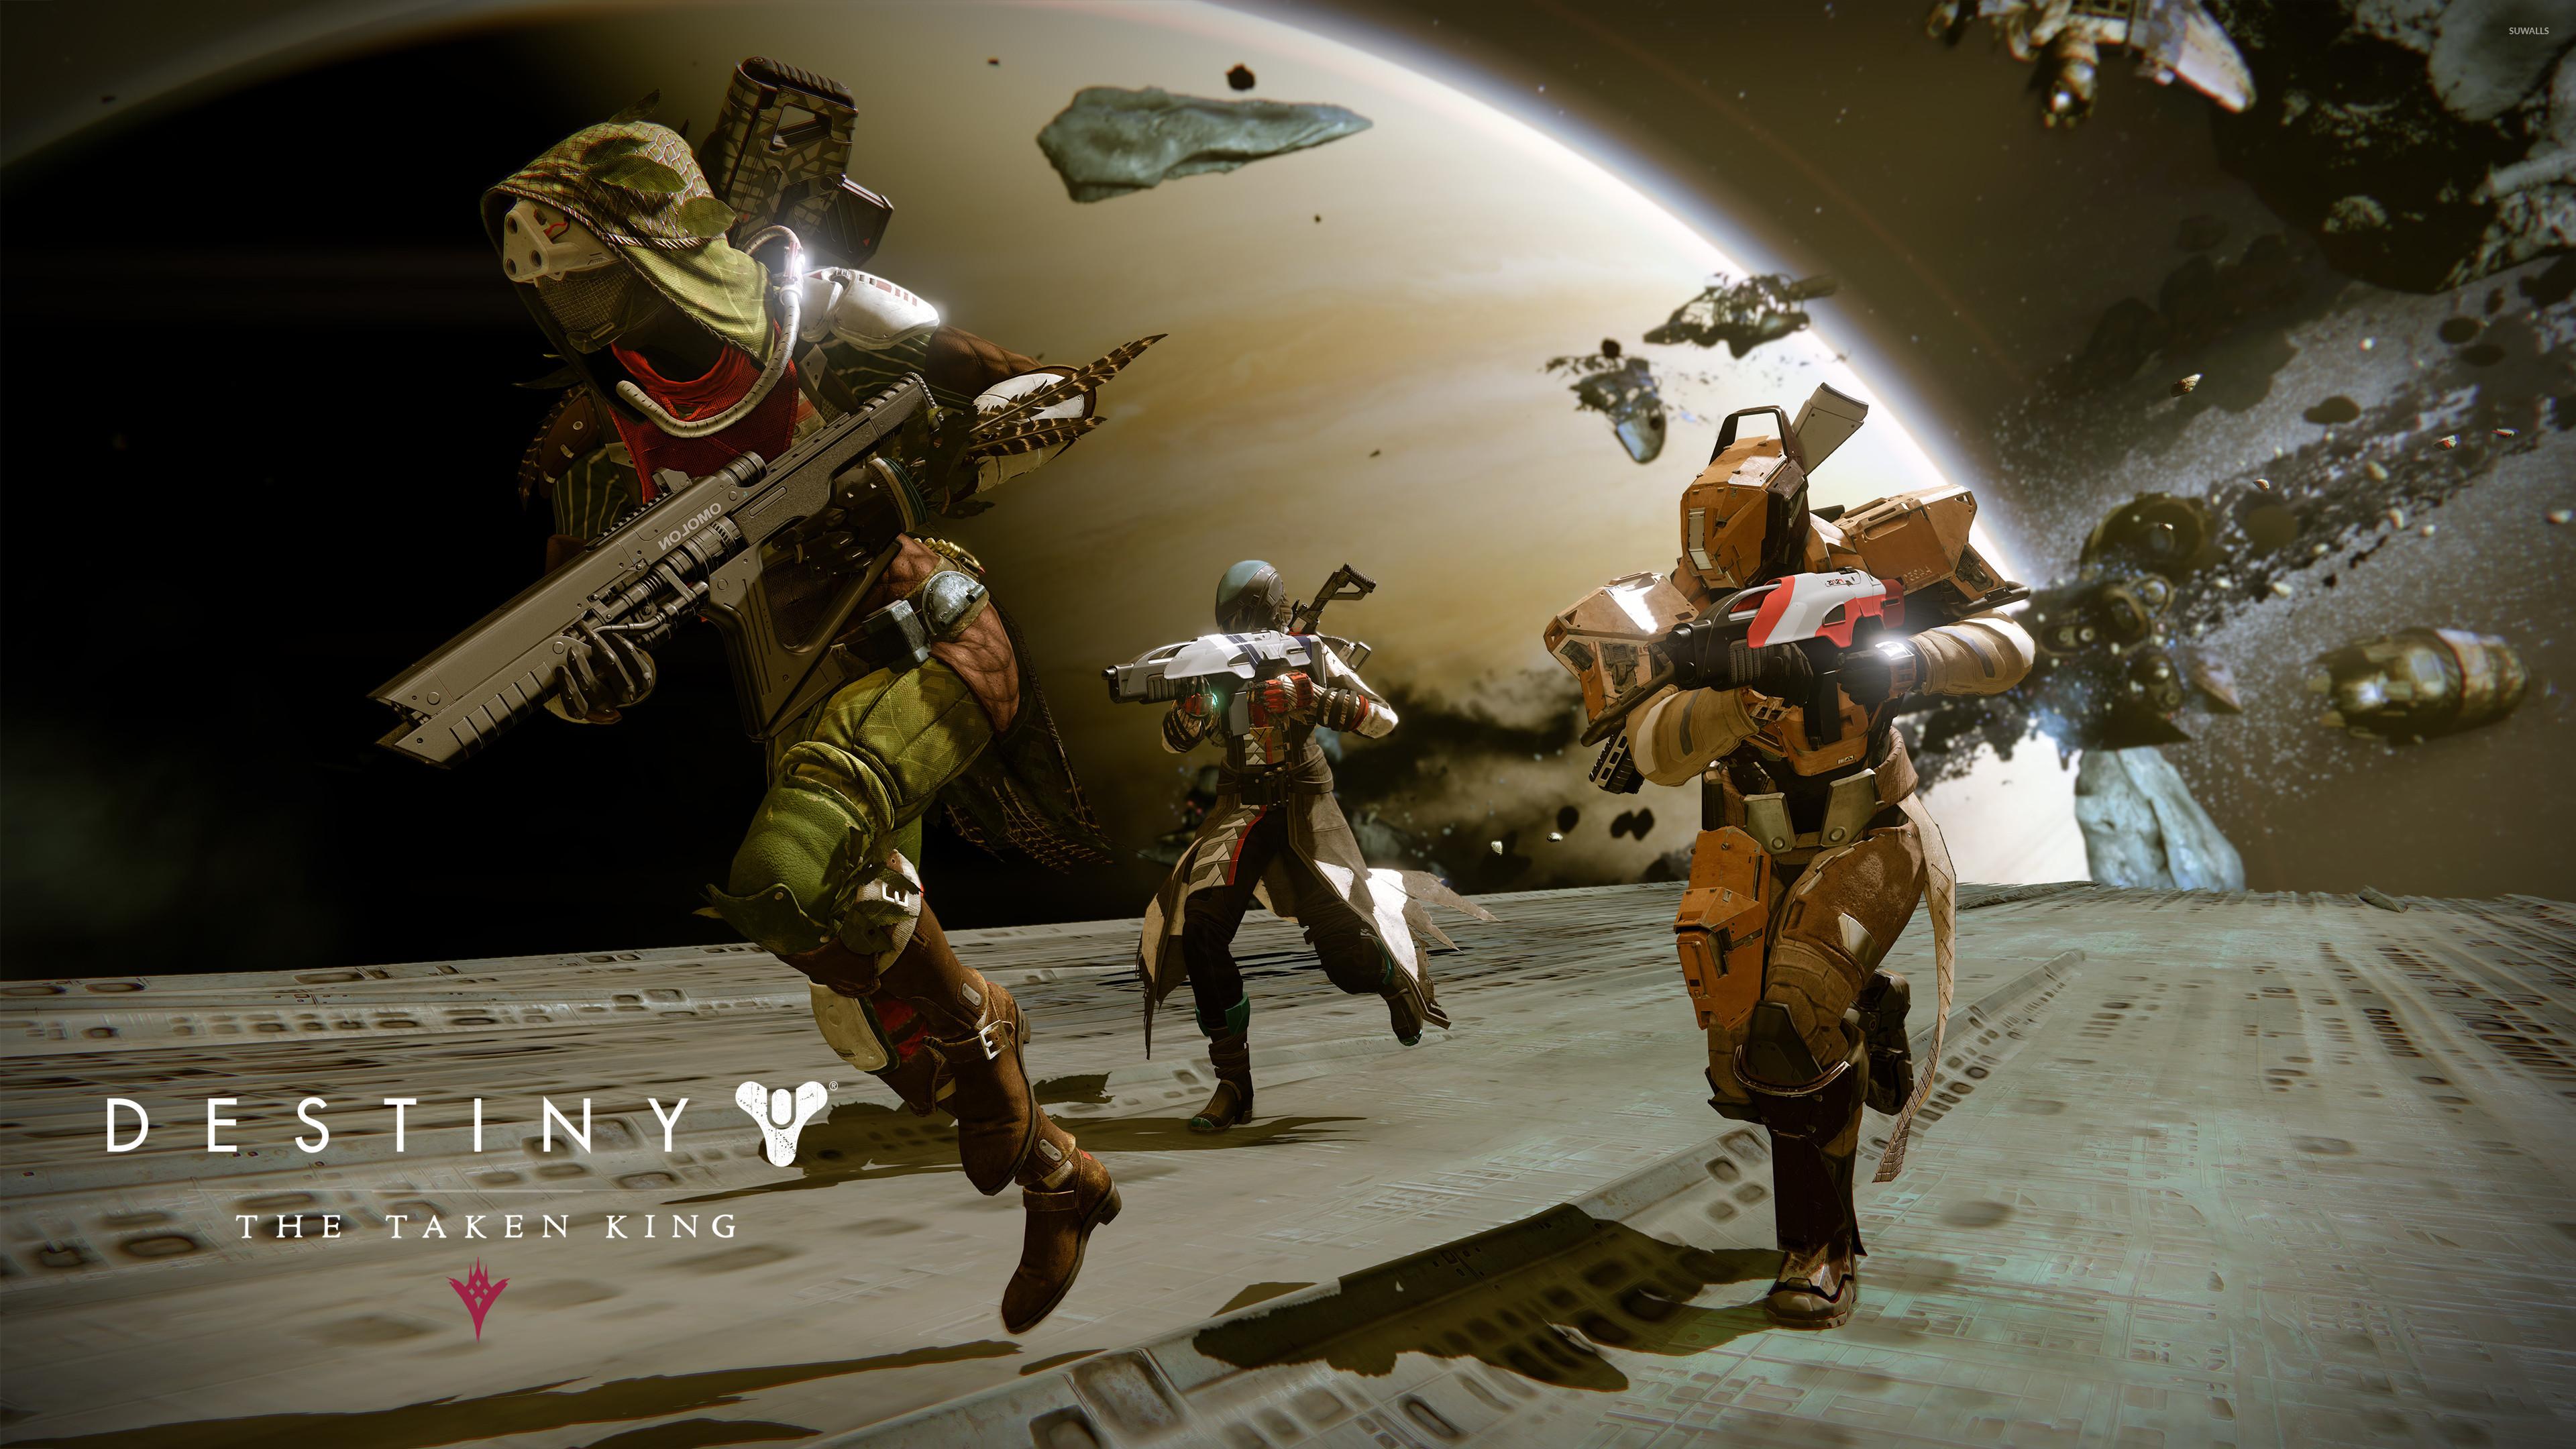 Destiny The Taken King Wallpaper: Destiny Wallpaper Titan (85+ Images